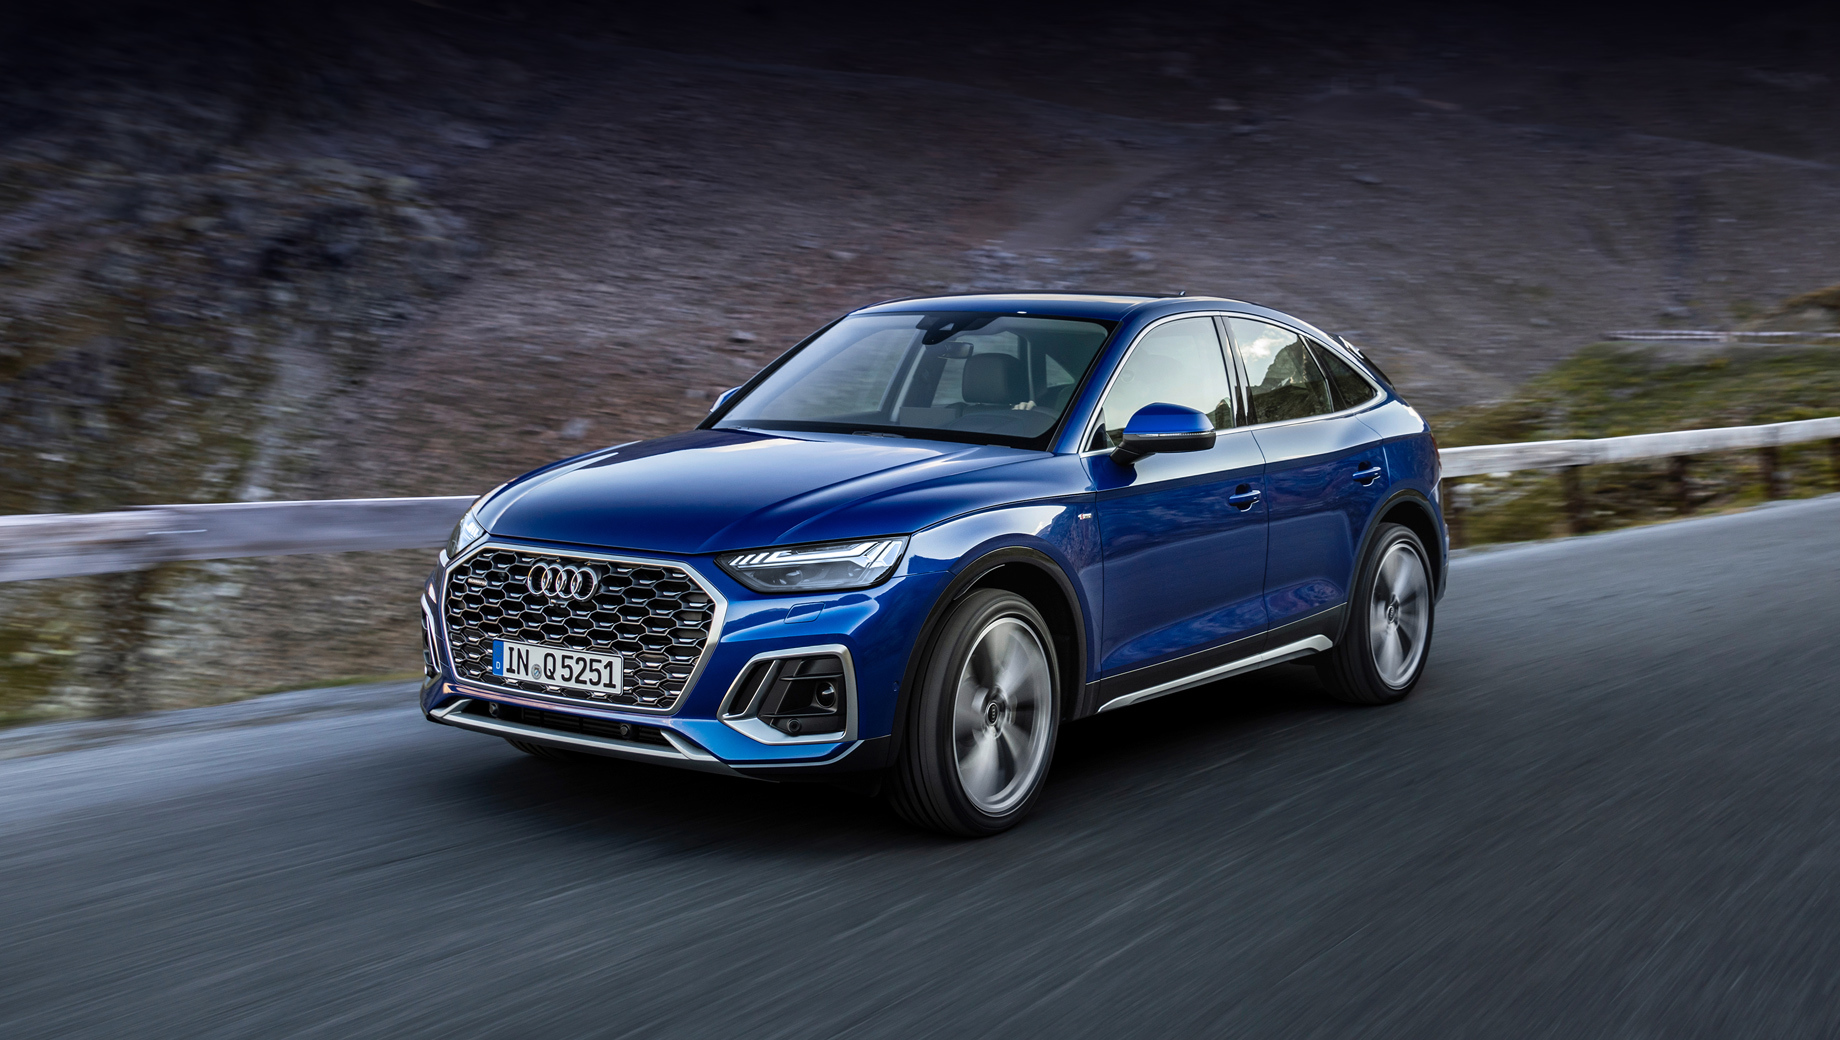 Audi q5,Audi q5 sportback. Спортбеку с индексом Q5 предстоит соперничать с такими моделями, как BMW X4 и Mercedes-Benz GLC Coupe.